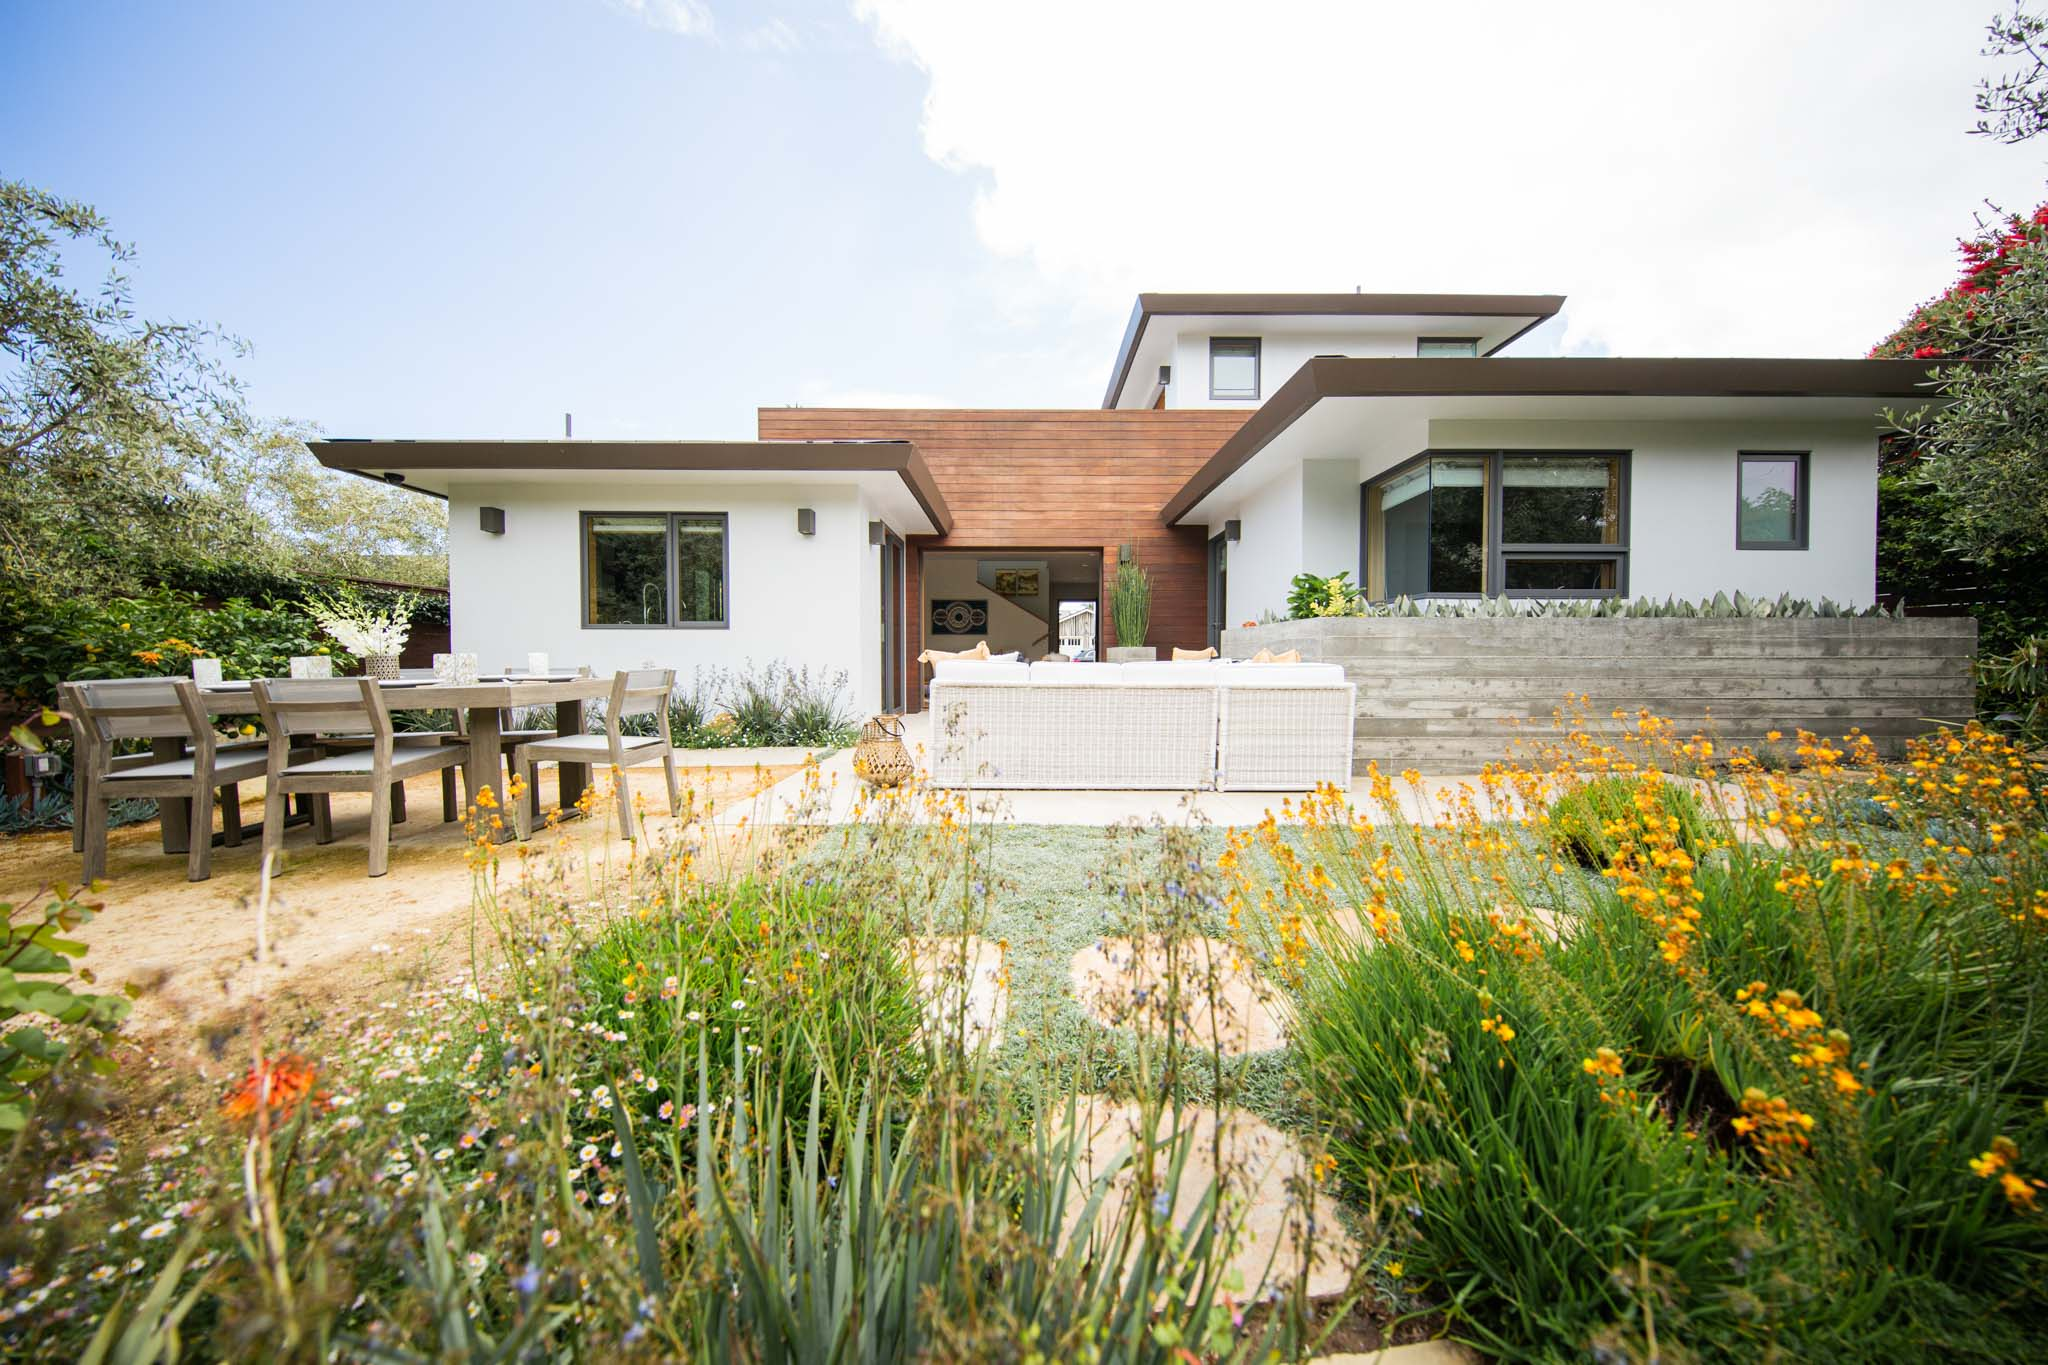 Jodi G Designs | Santa Barbara Interior Design Lanscape -1.jpg